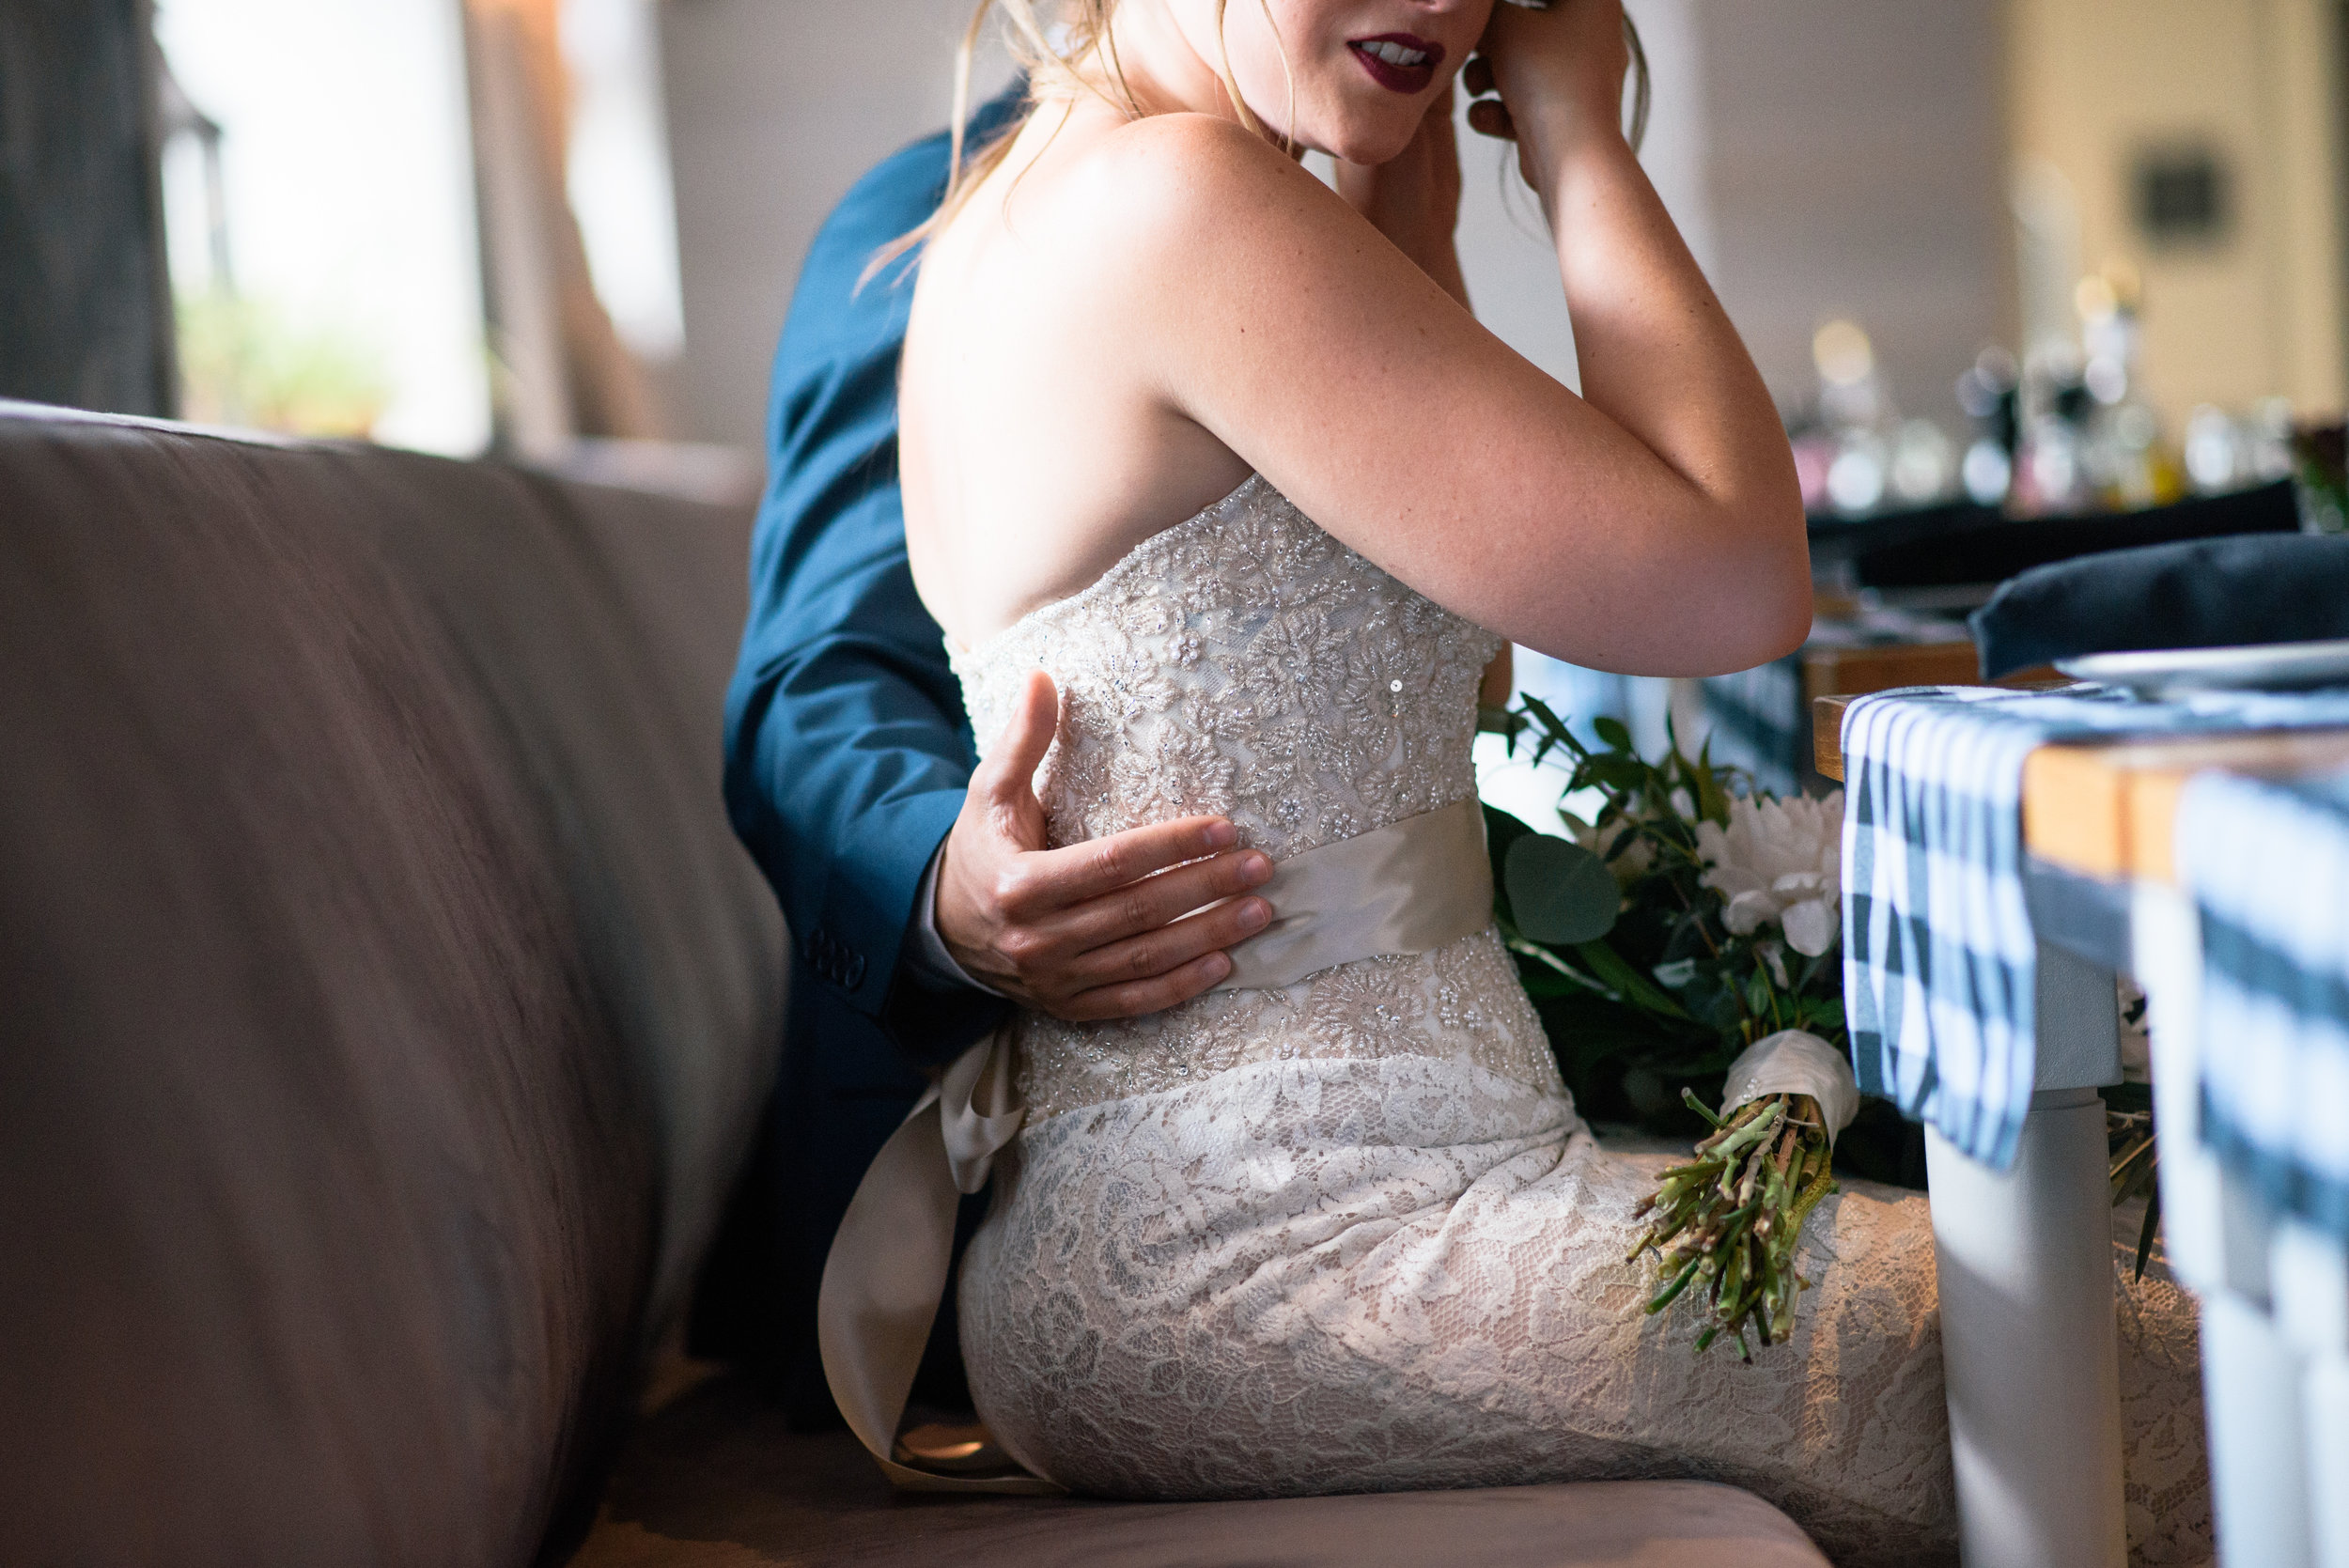 savannah-station-elopement-photographer-savannah-elopement-photography-savannah-georgia-elopement-photographer-savannah-wedding-photographer-meg-hill-photo-jade-hill- (31 of 93).jpg